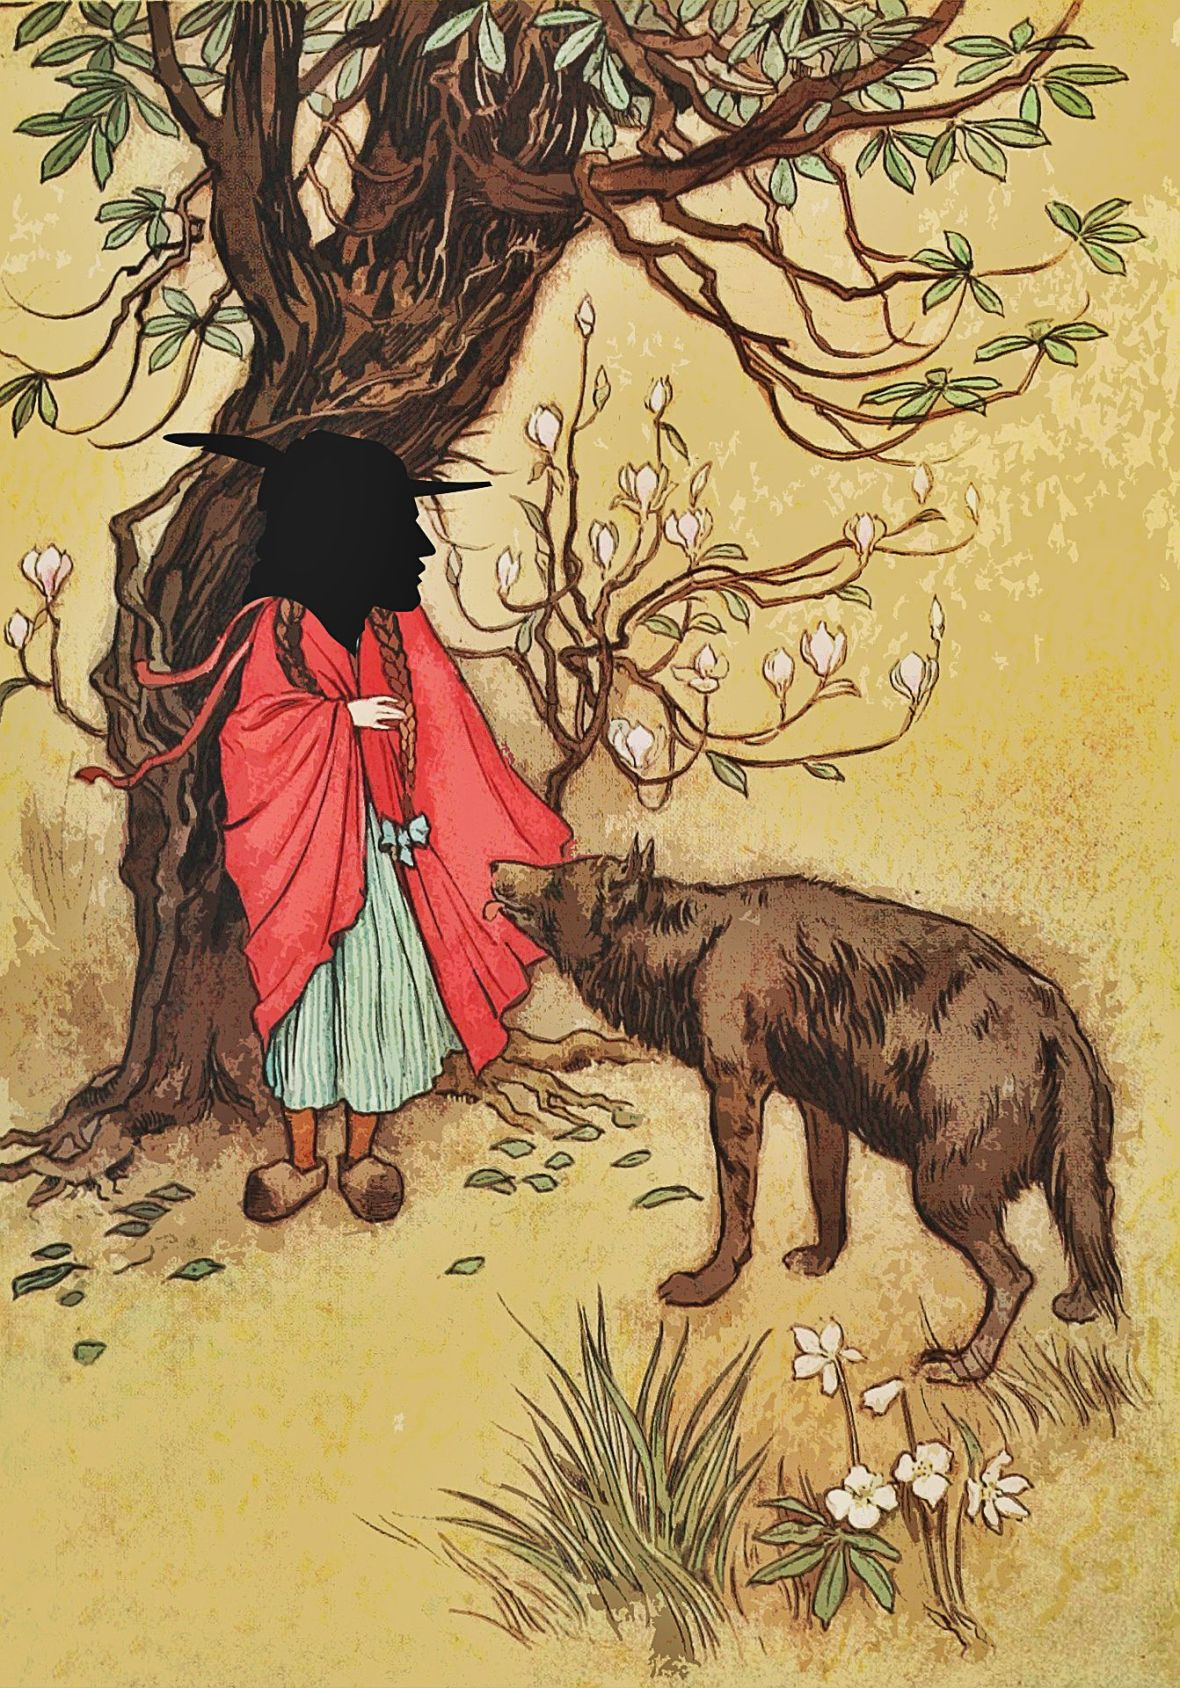 Red Robin Hood image.jpg